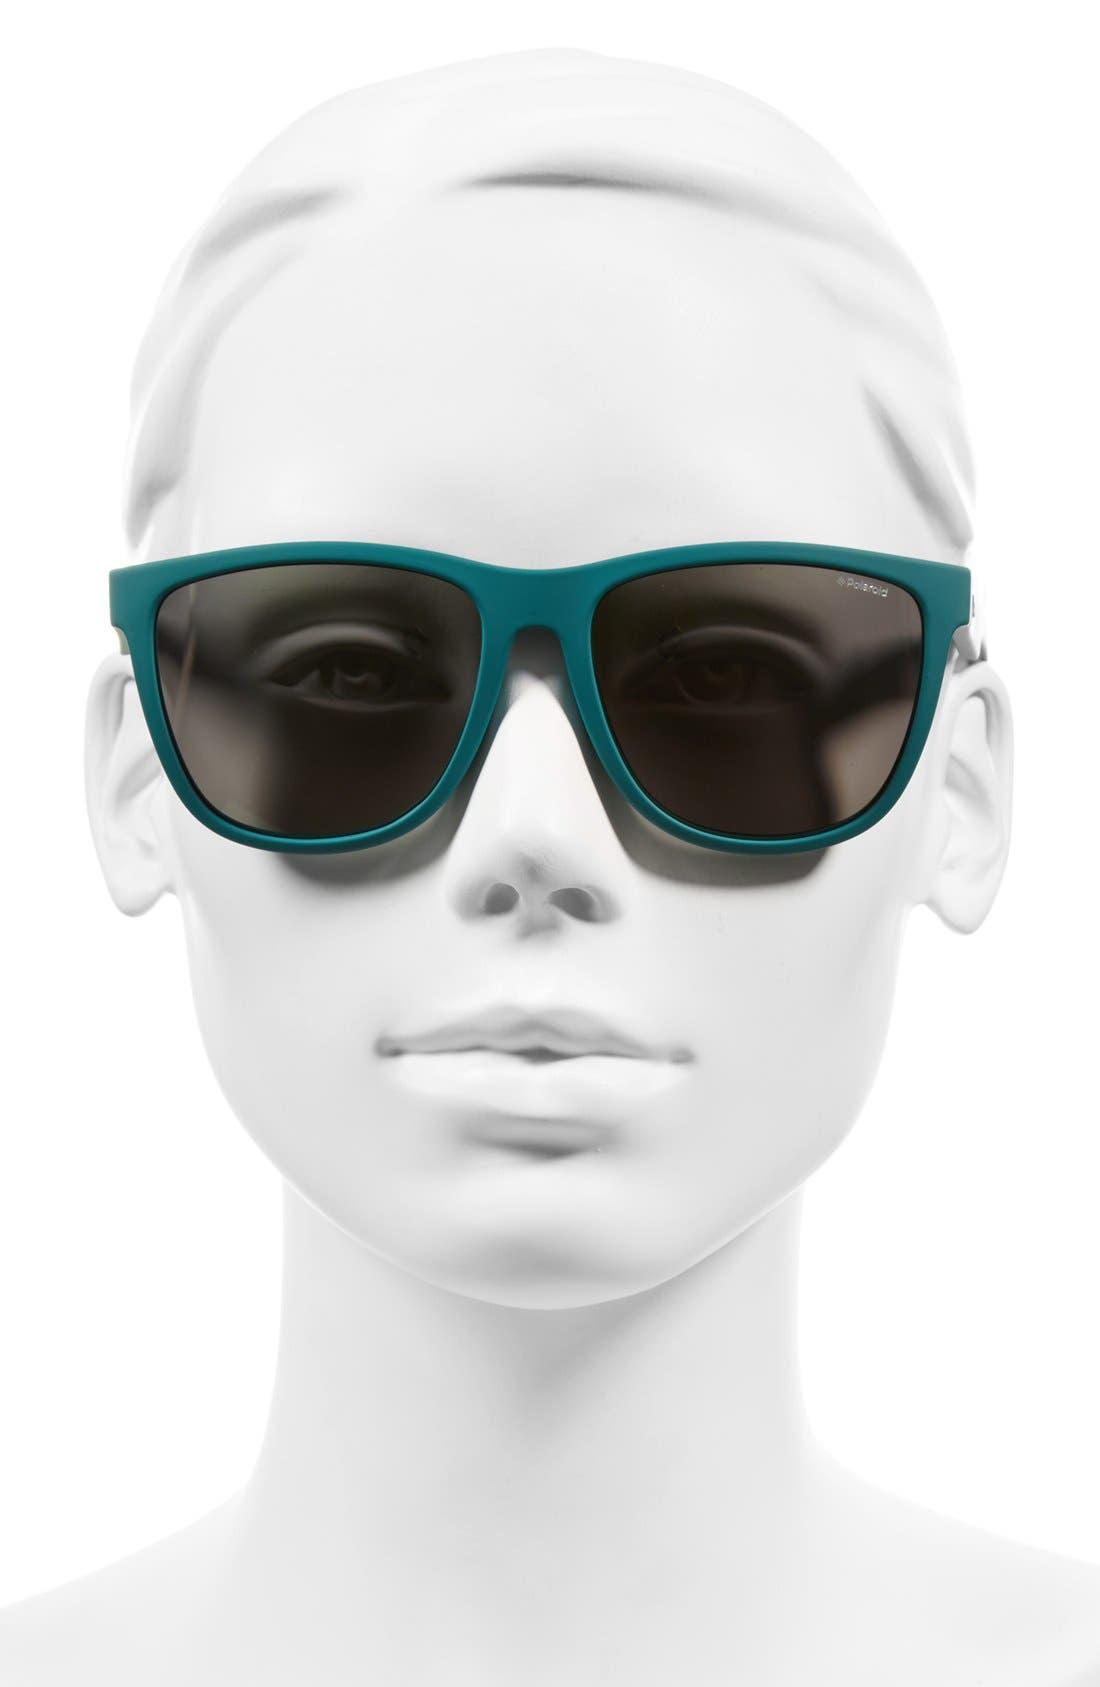 56mm Retro Polarized Sunglasses,                             Alternate thumbnail 2, color,                             Green/ Grey Gold Mirror